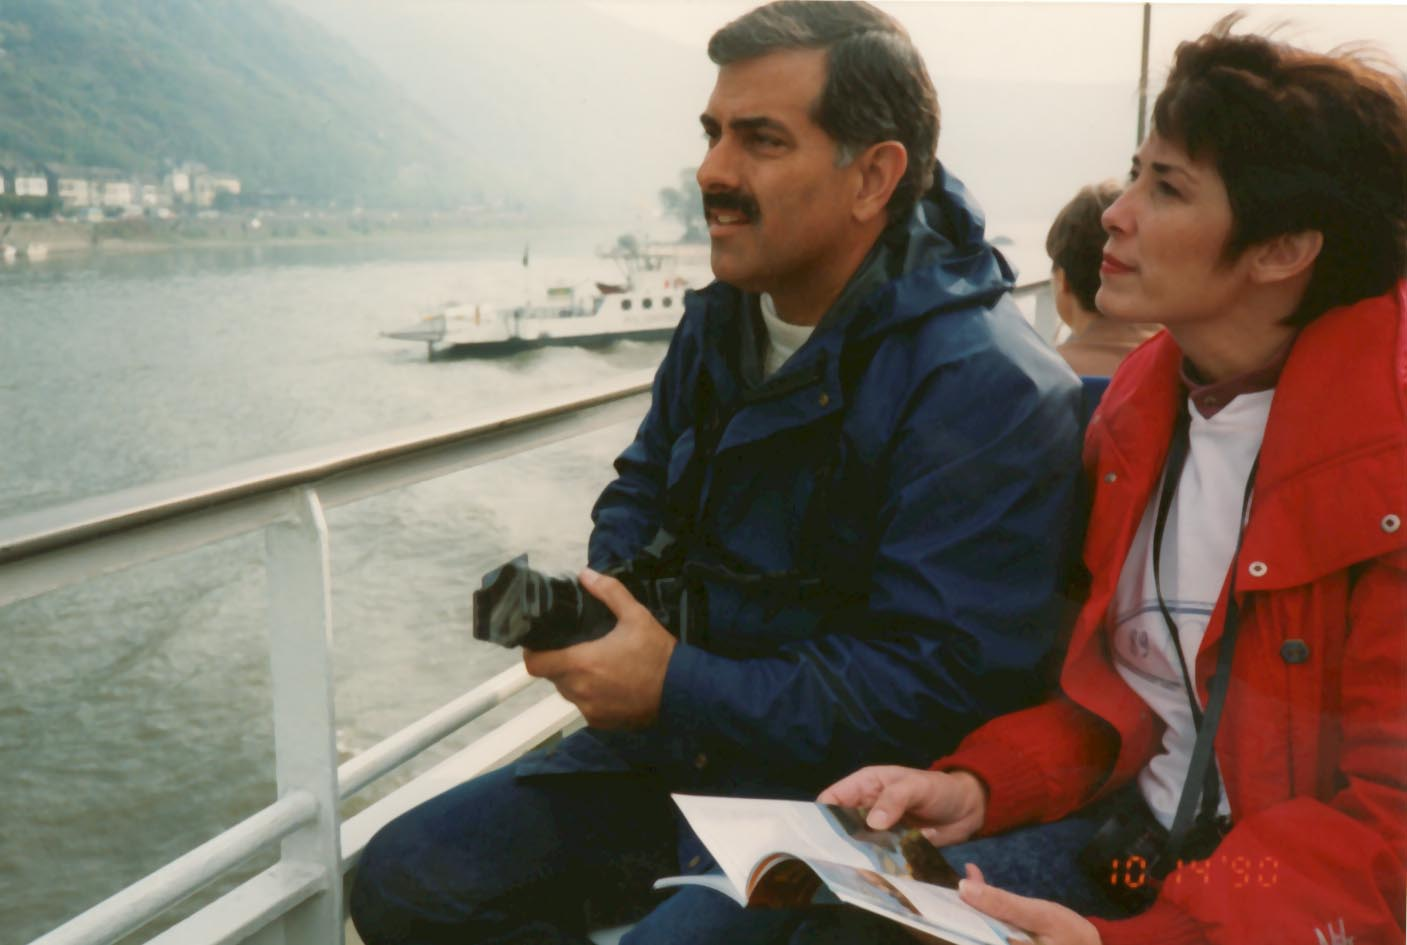 On the Rhine, 1990